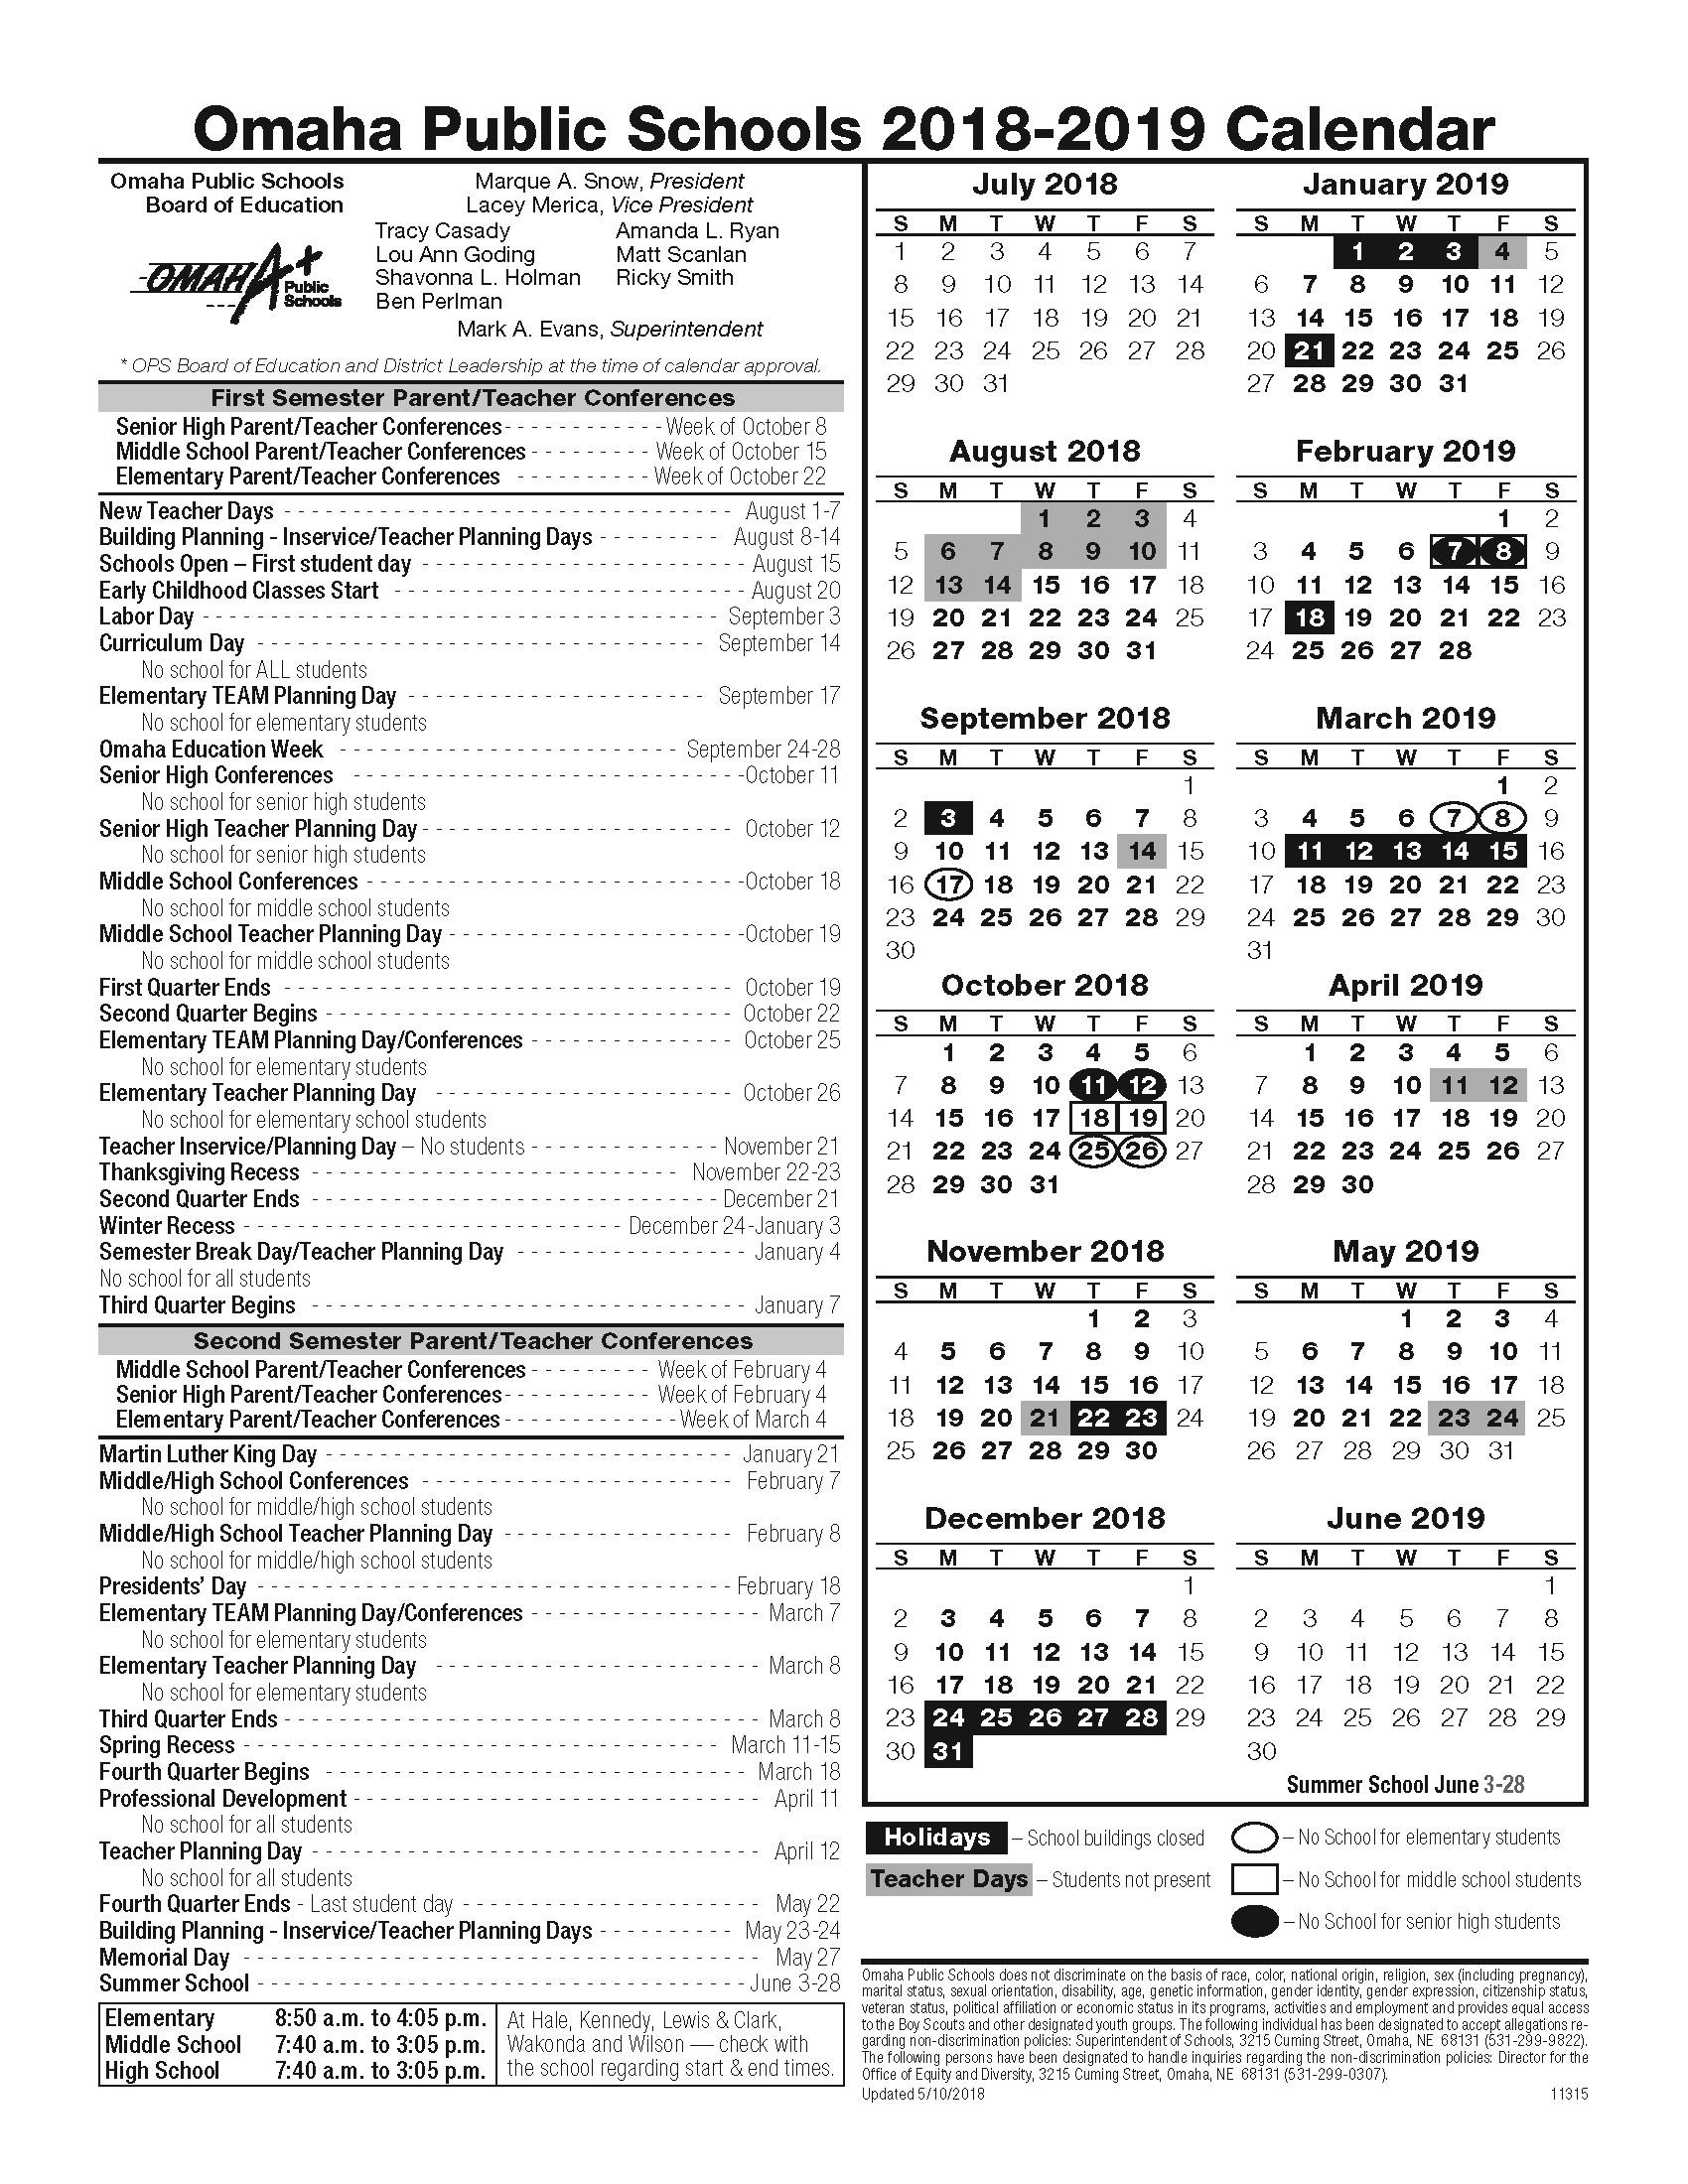 Calendario Escolar 2019 Kinder Recientes Updated 2018 19 Academic Calendar Omaha Public Schools Of Calendario Escolar 2019 Kinder Más Reciente 2018 2019 School Year Calendar Upper Canada District School Board